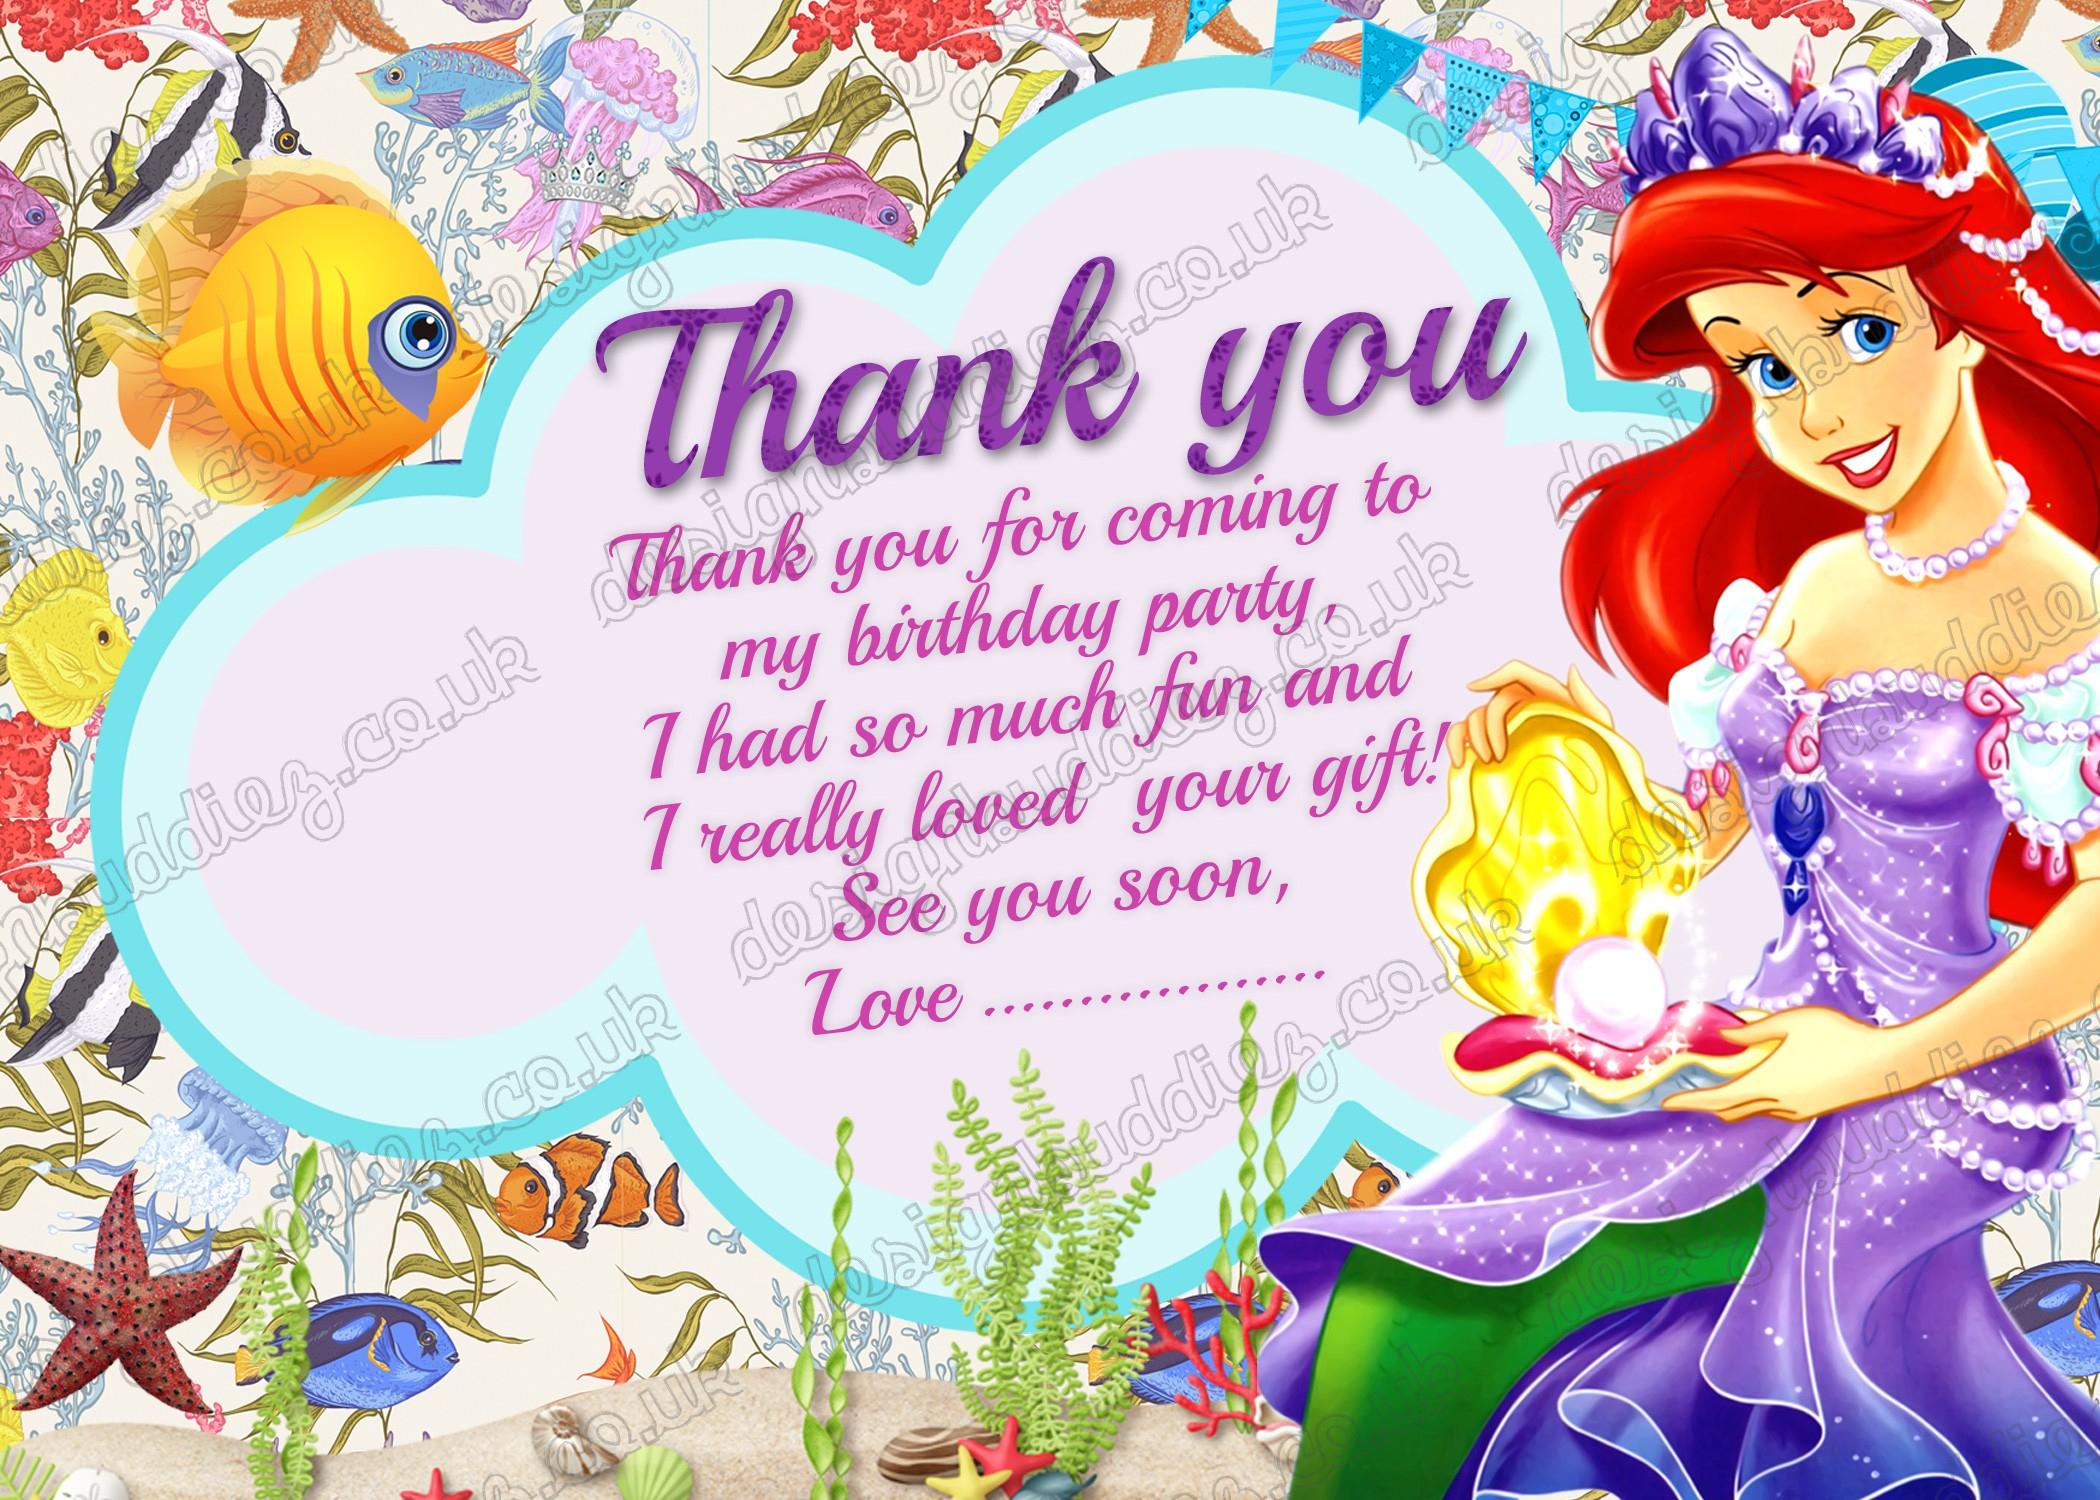 Printable-Disney-Princess-Ariel-Little-Mermaid-Thank-You-Card - Free Printable Mermaid Thank You Cards